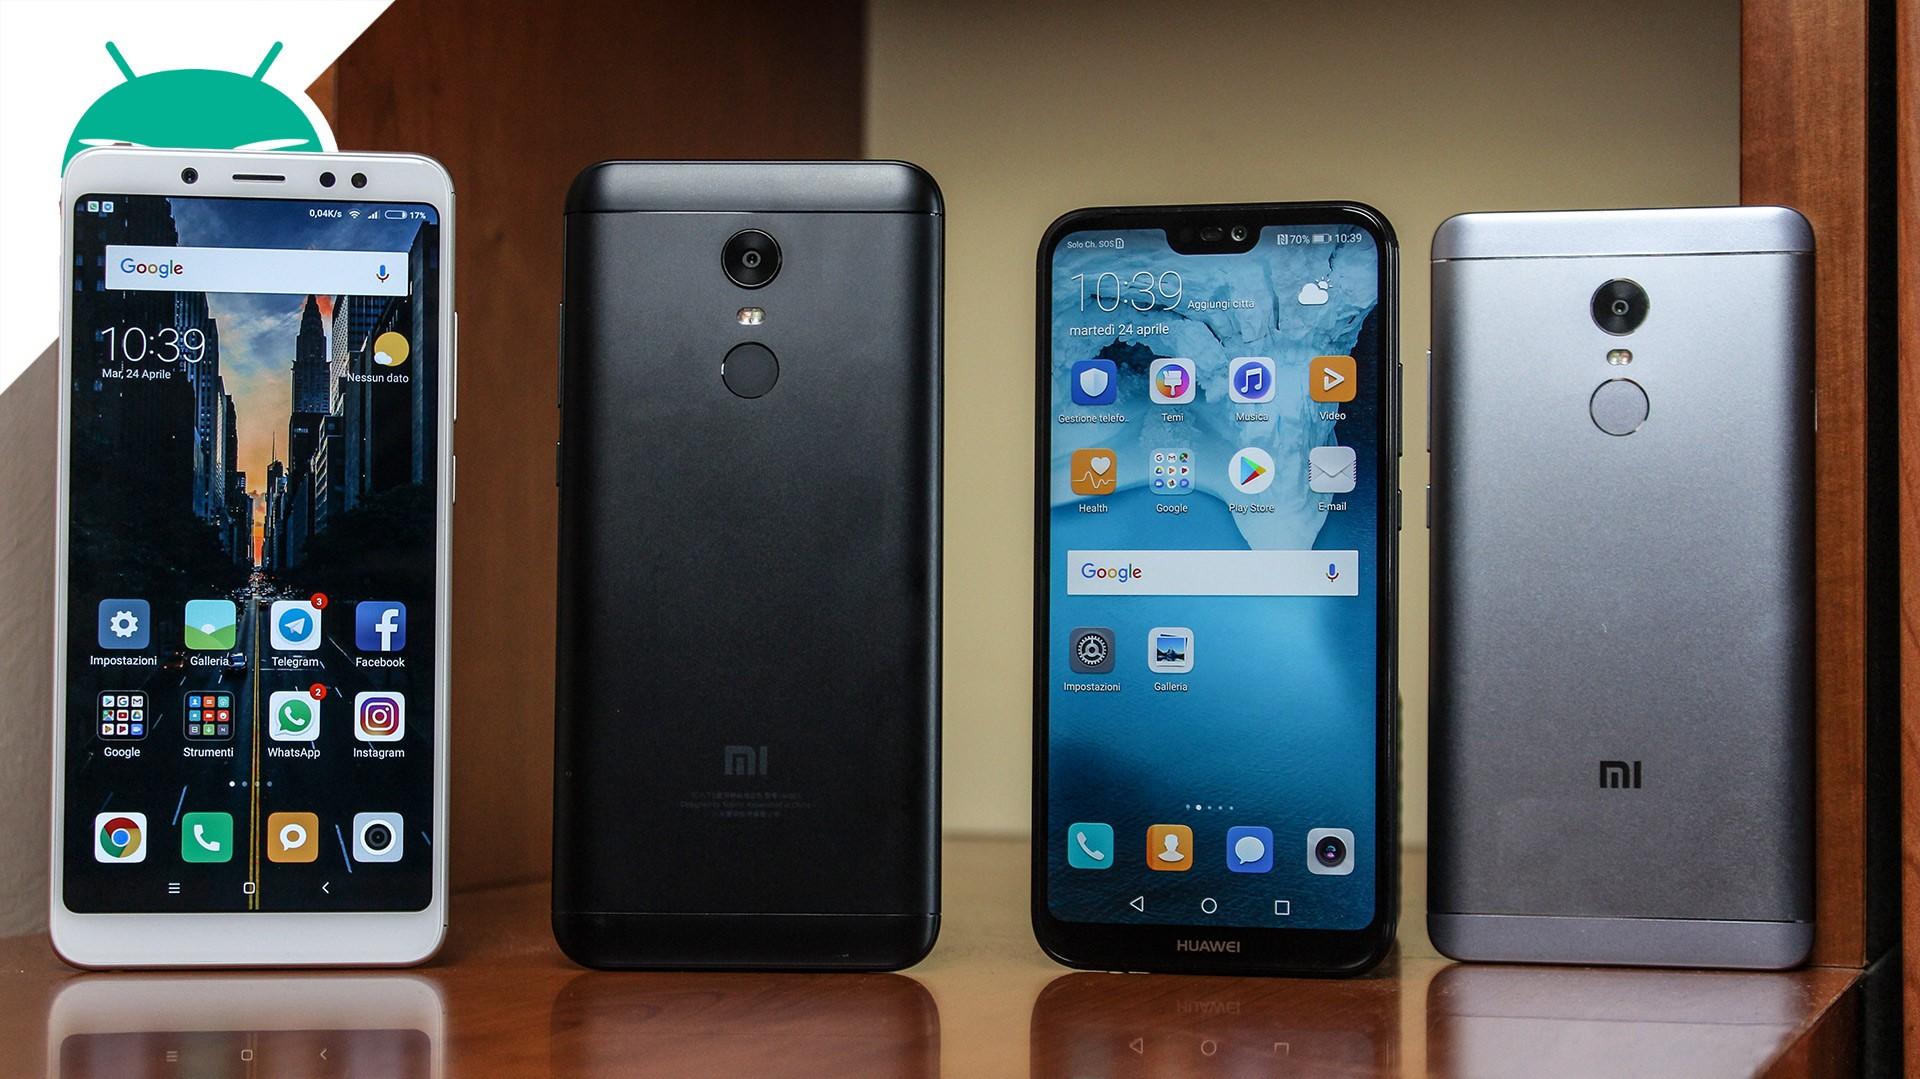 Configure Xiaomi Redmi Note 4 Vs 5 64gb Black Plus Huawei P20 Lite